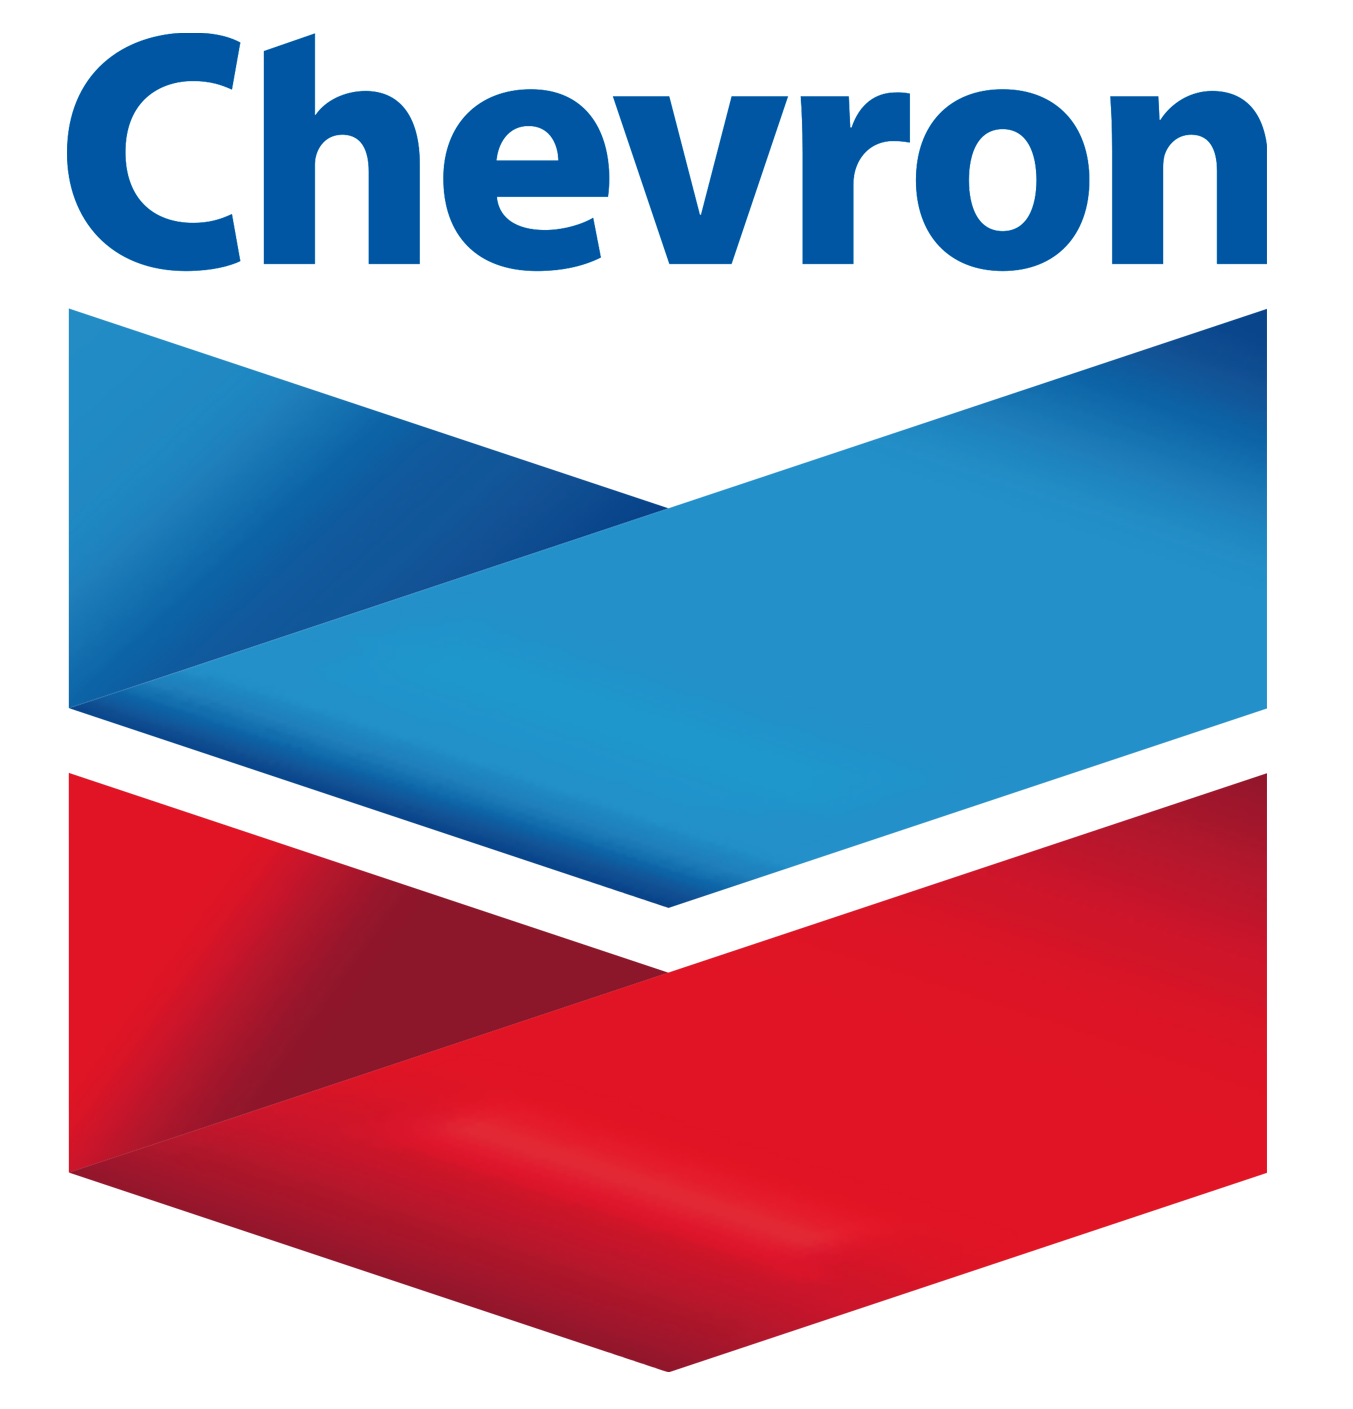 Chevron Way Oil Vistac 68